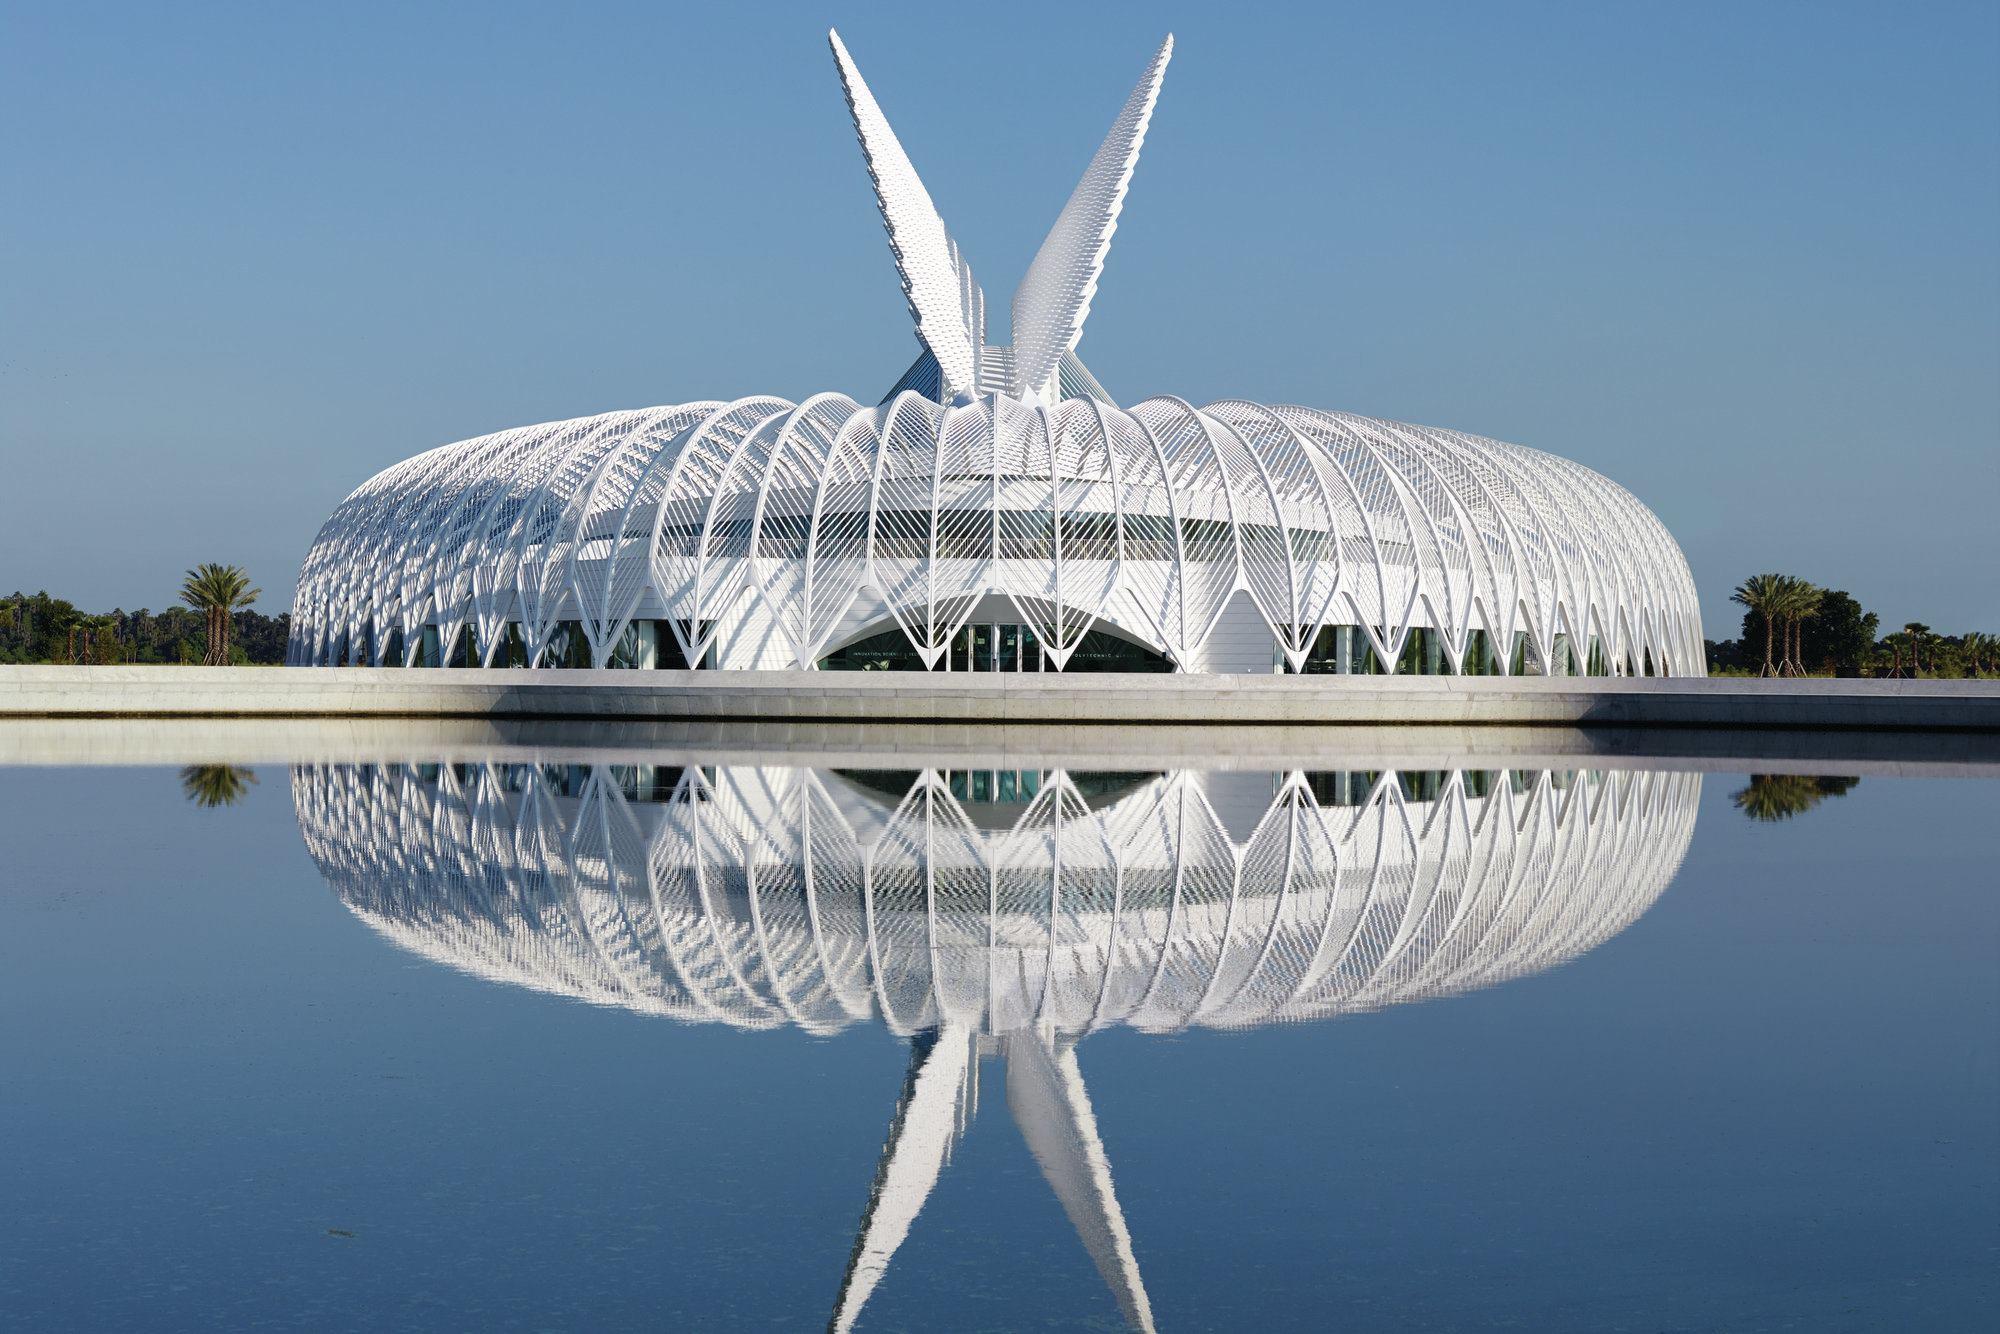 floridapolytechnicuniversity-calatrava-exterior1-hero-tcm20-2169568.jpg